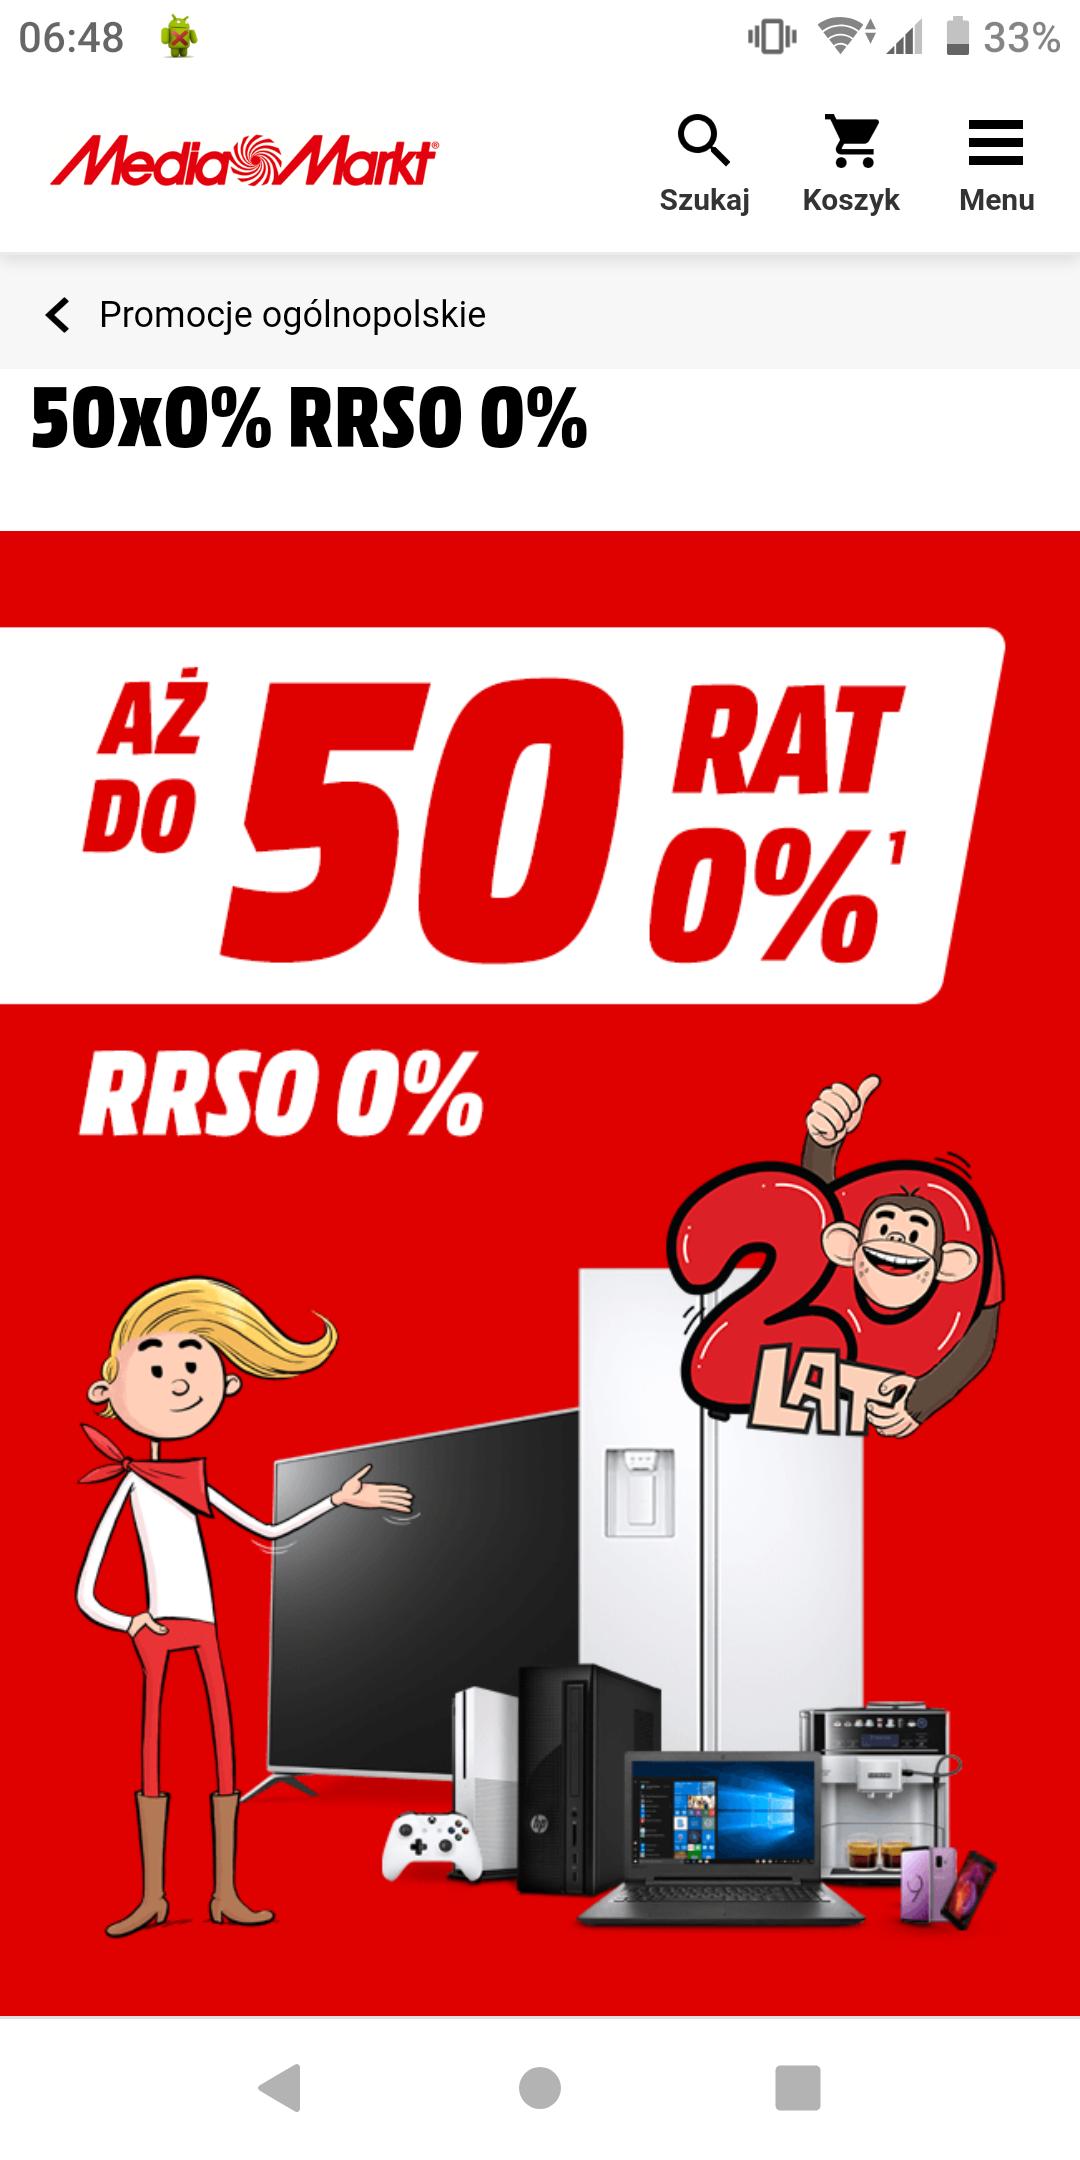 Mediamarkt do 50 rat 0%